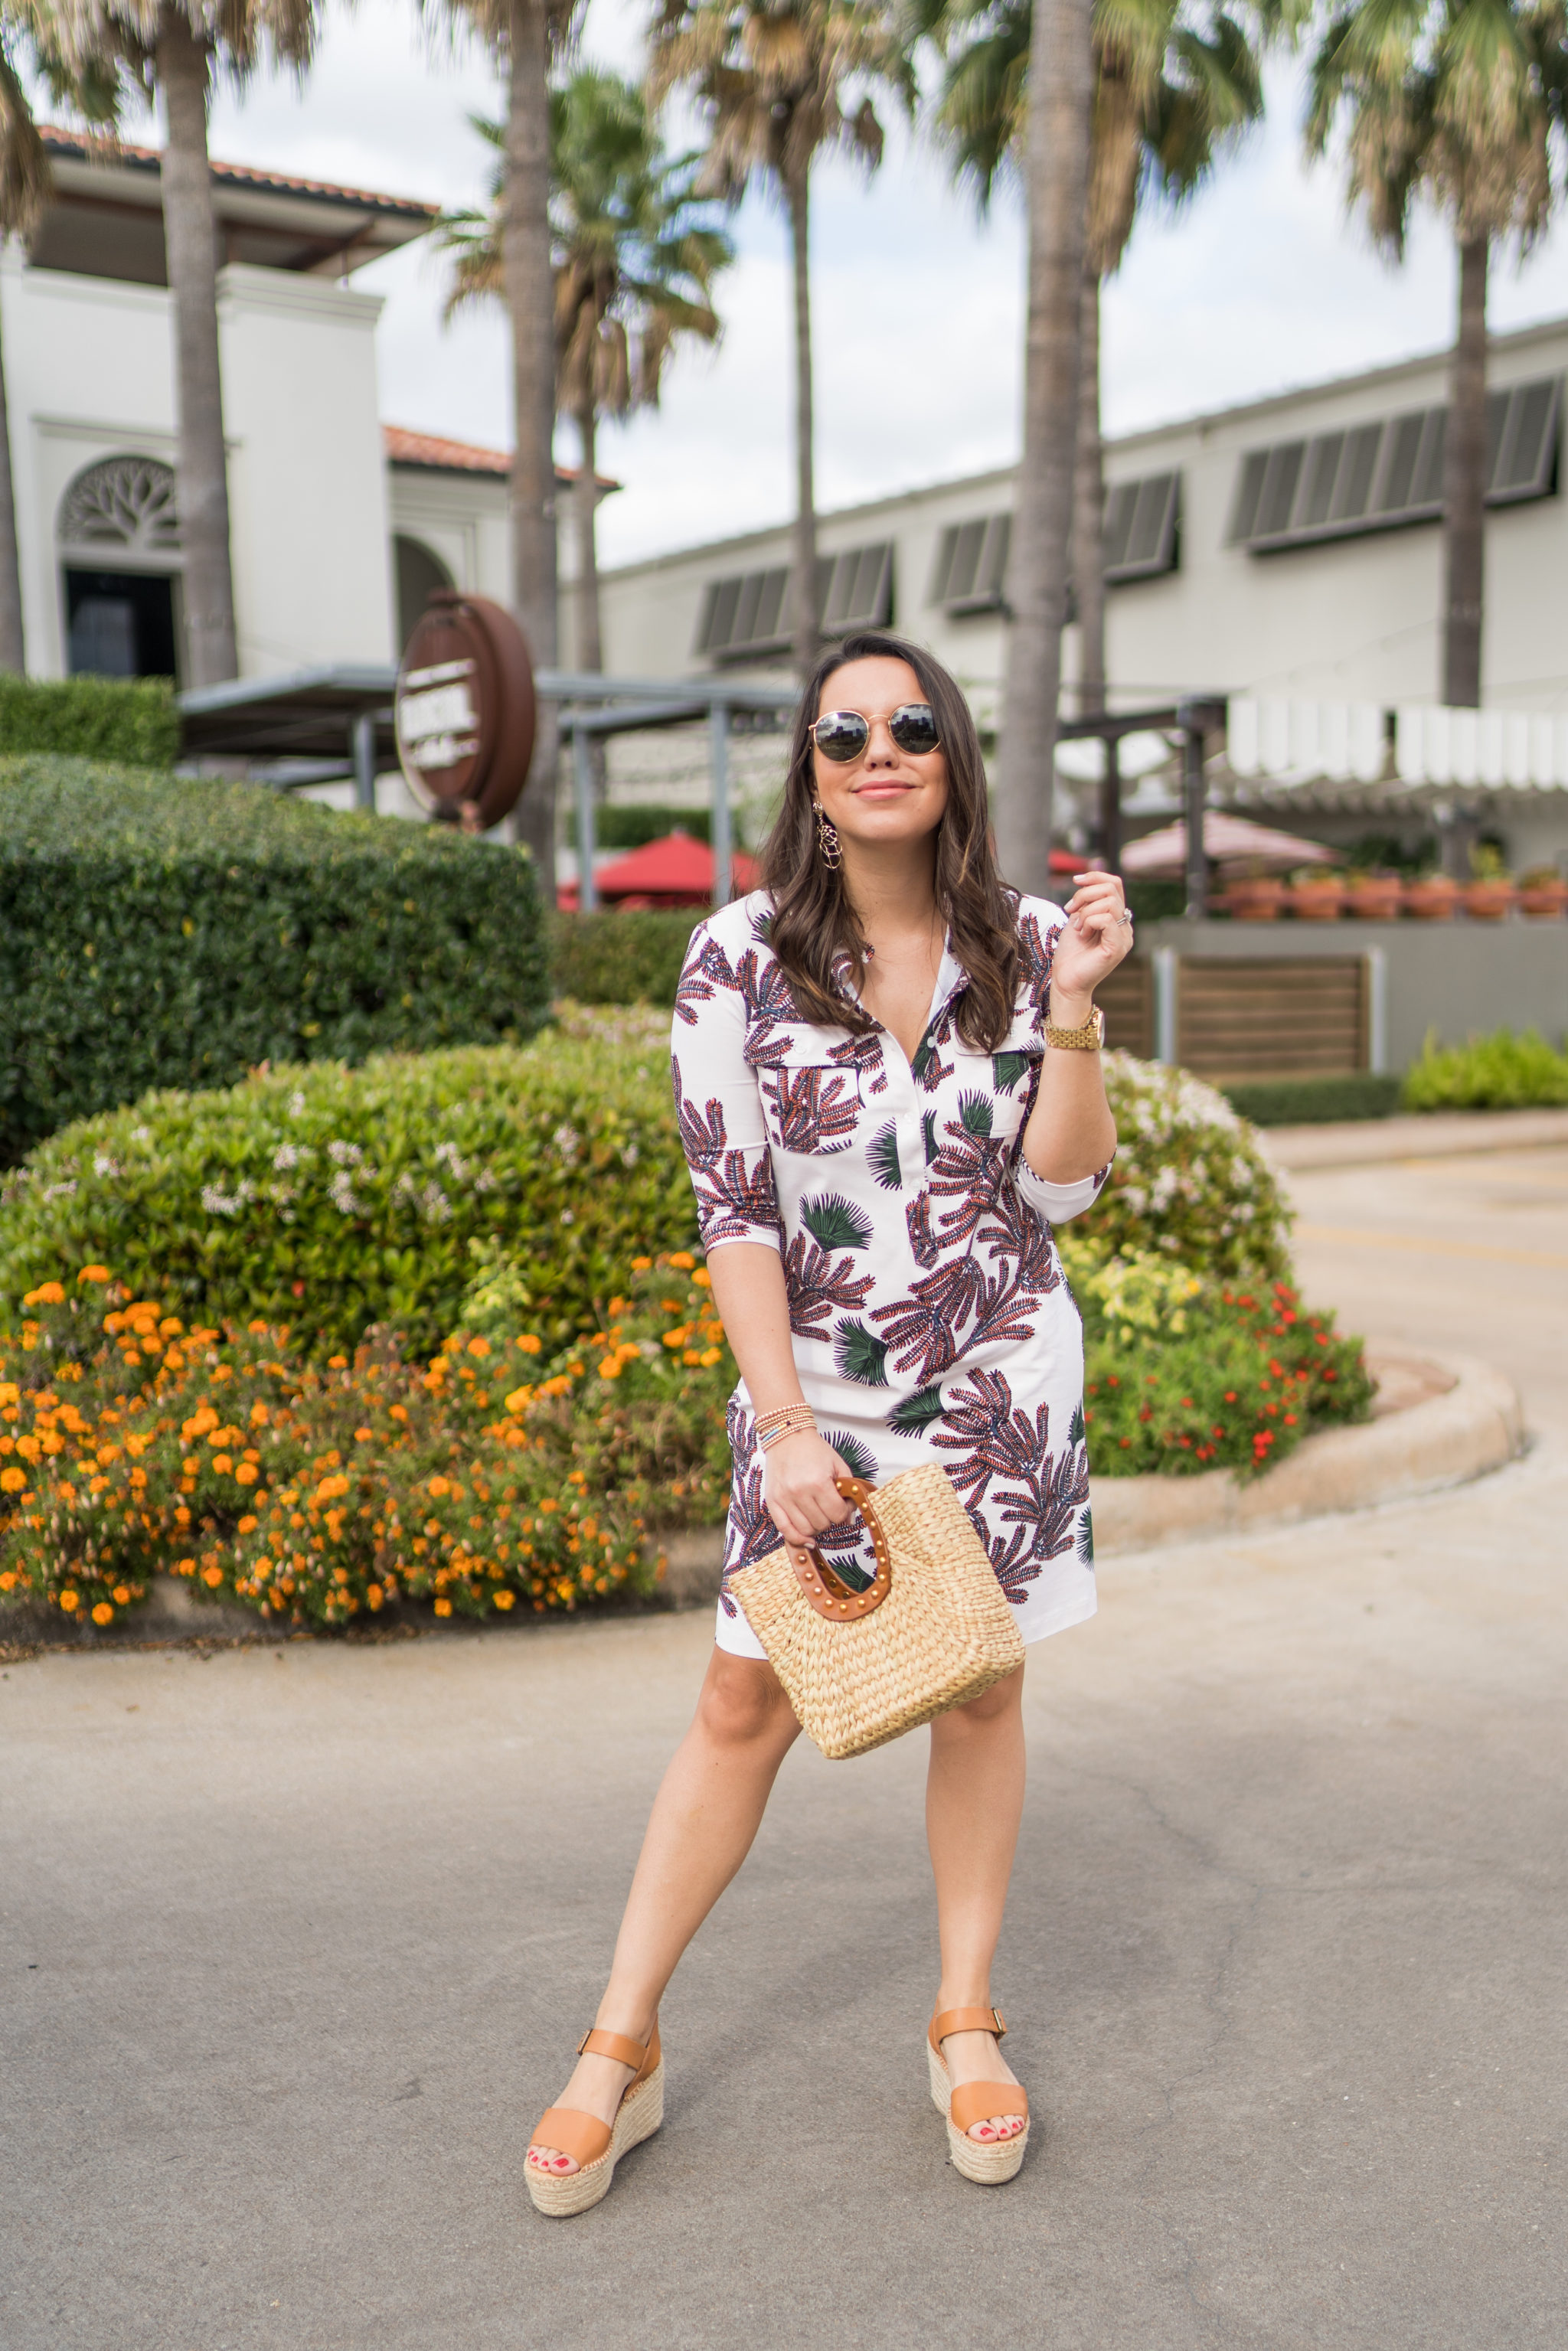 Preppy summer shirtdress and woven raffia accessories